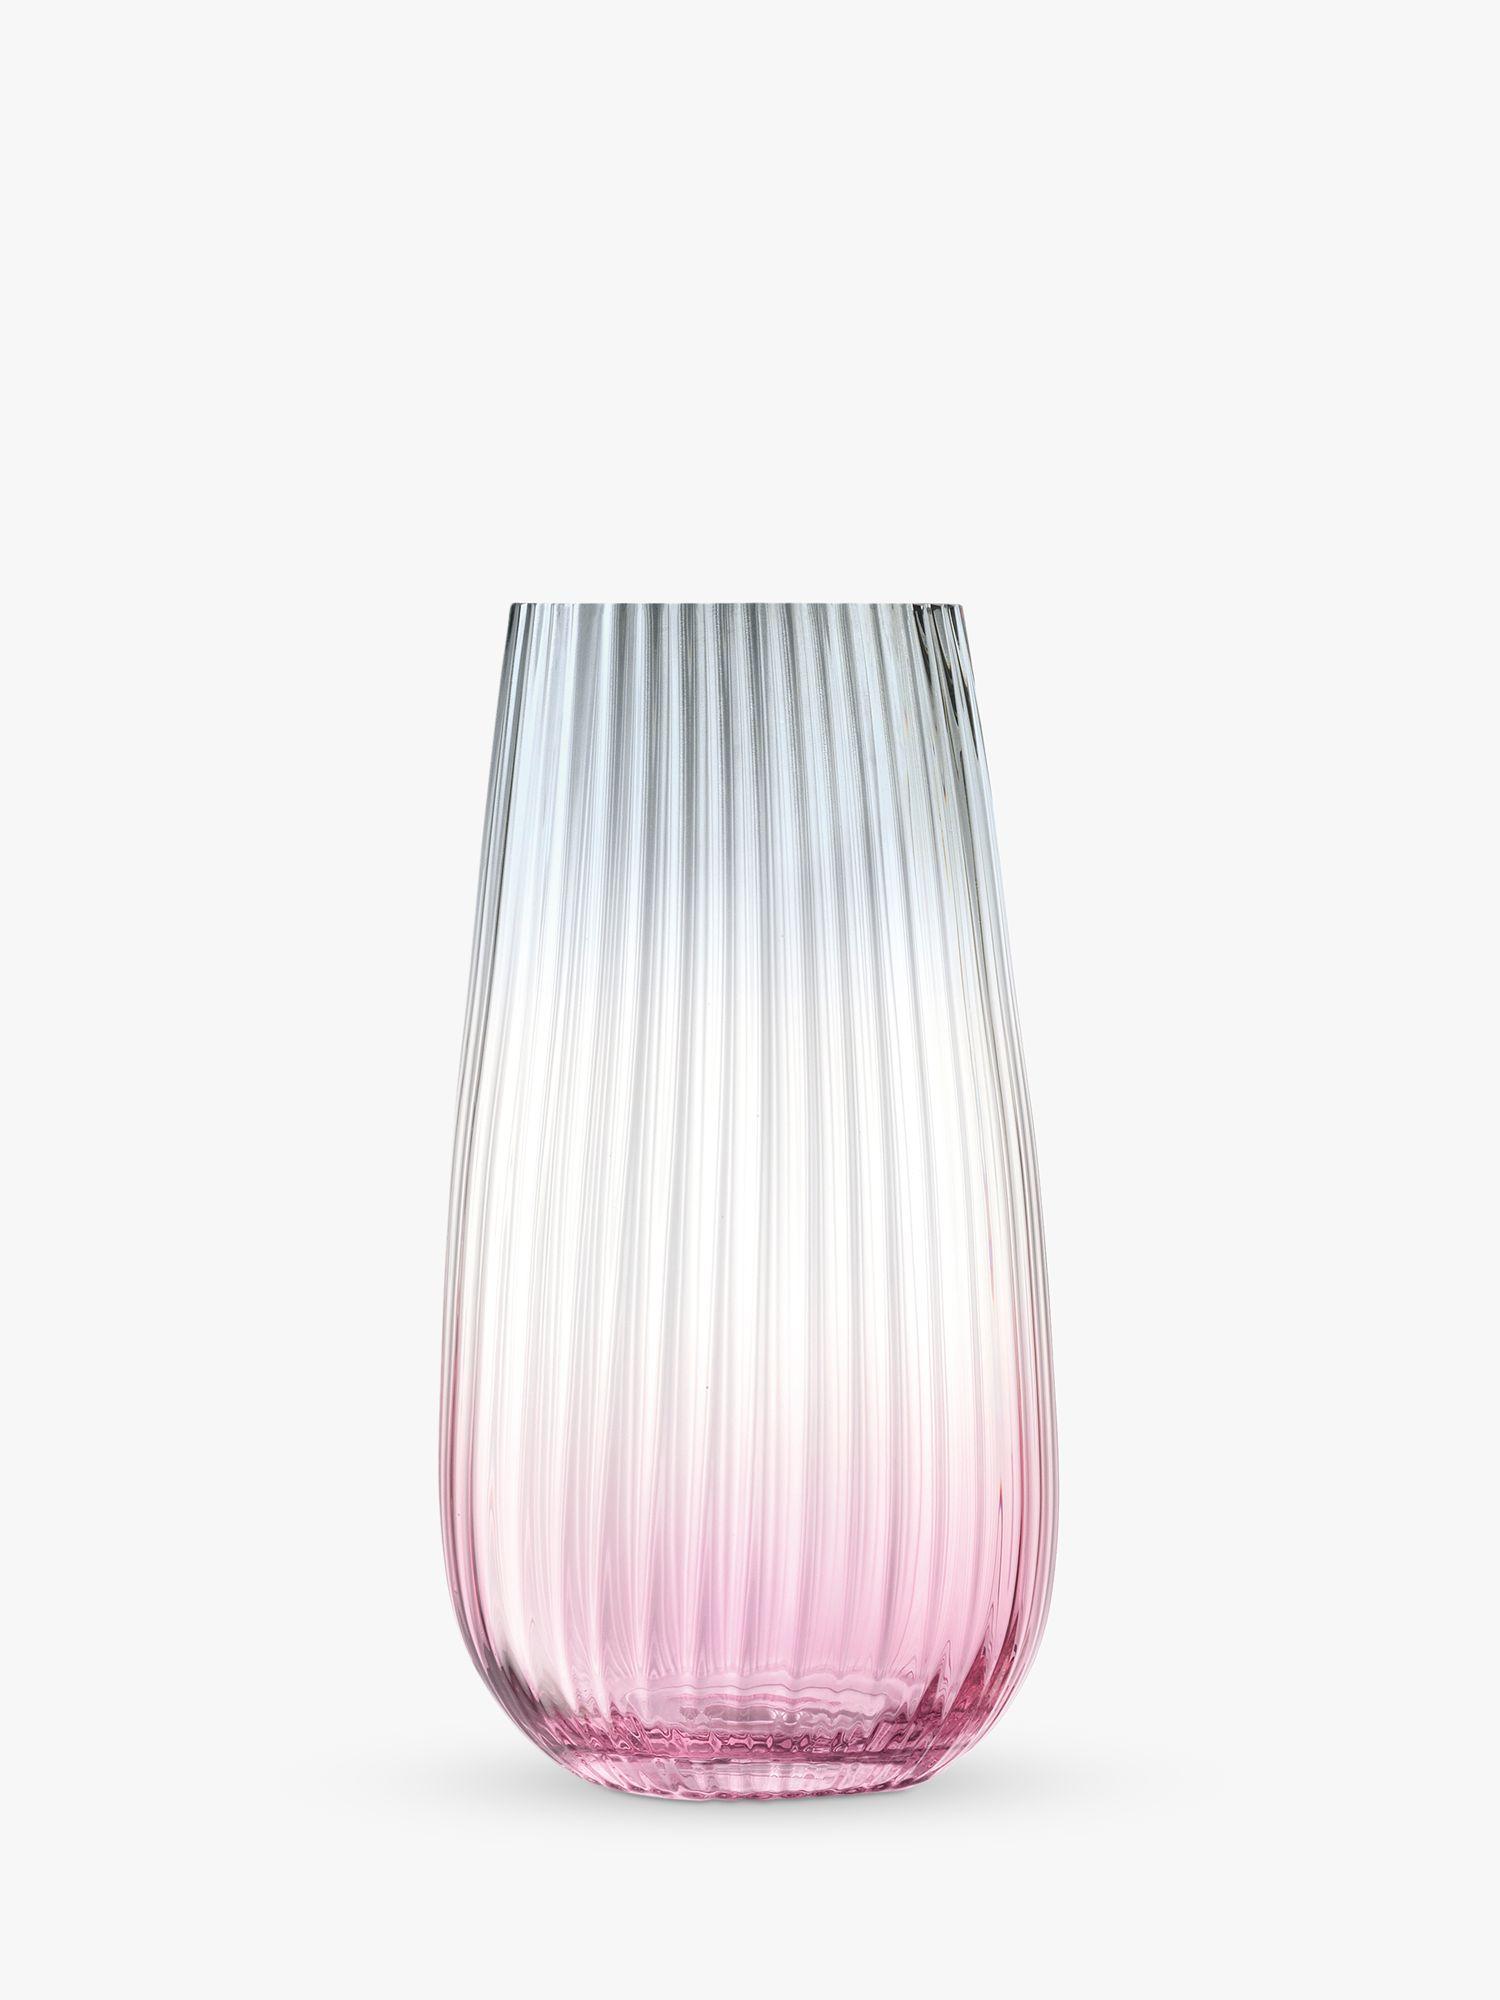 LSA International LSA International Dusk Vase, H28cm